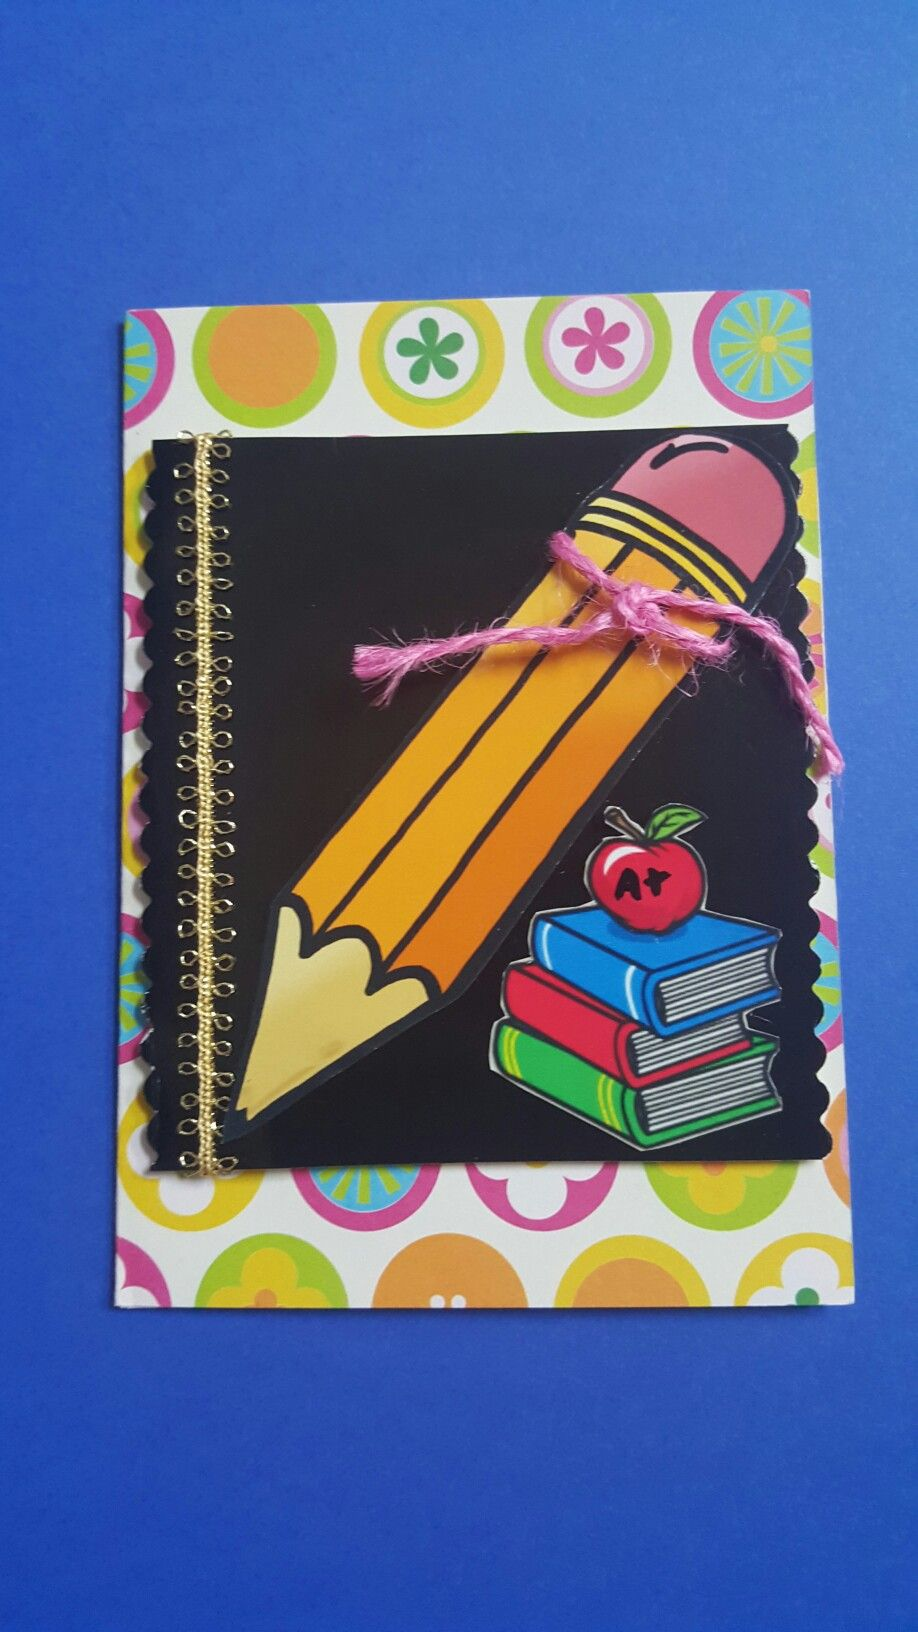 Invitation Card Design For Teachers Day Onvacationsite